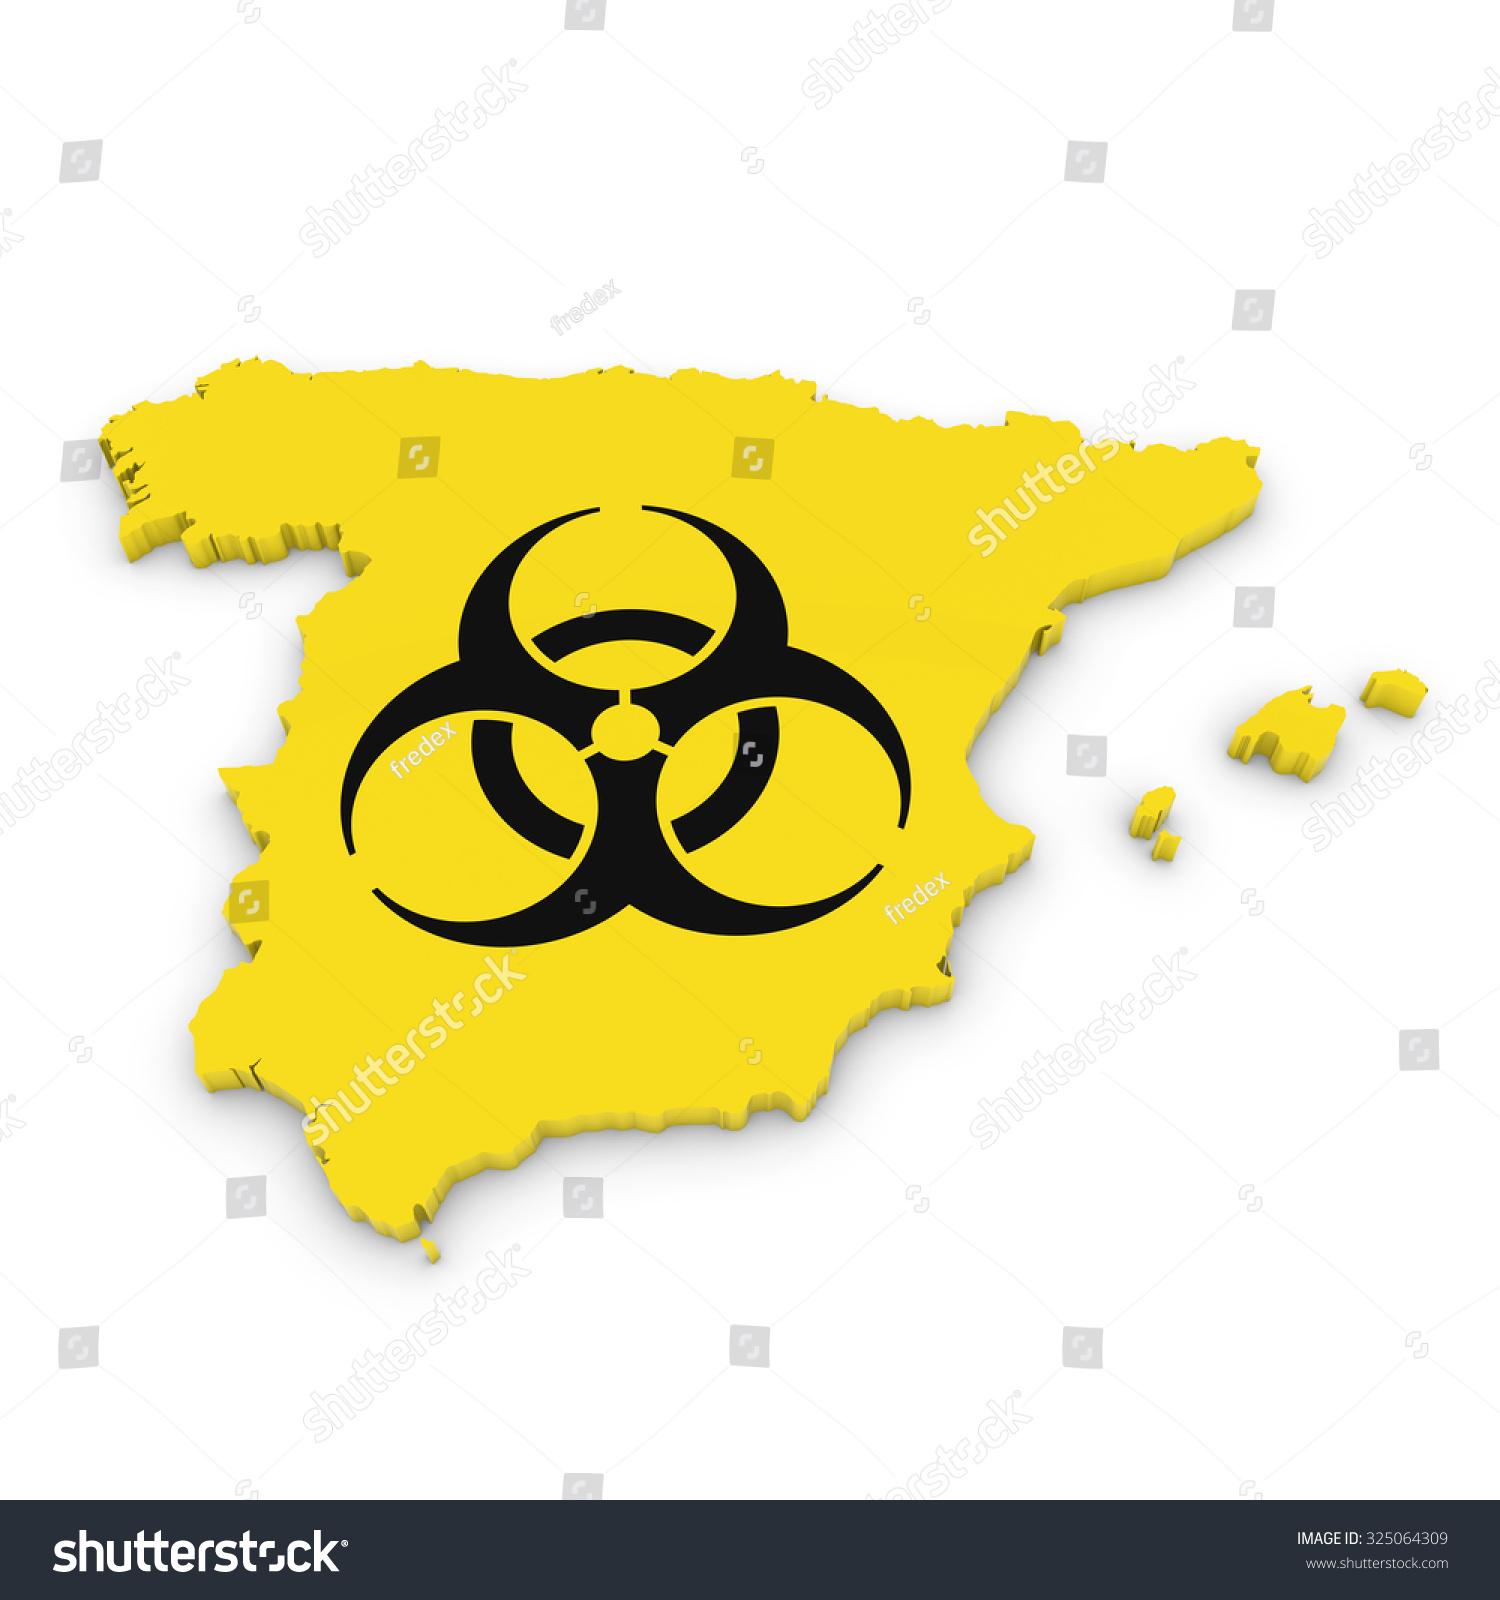 Spanish Biological Hazard Concept Image 3 D Stock Illustration